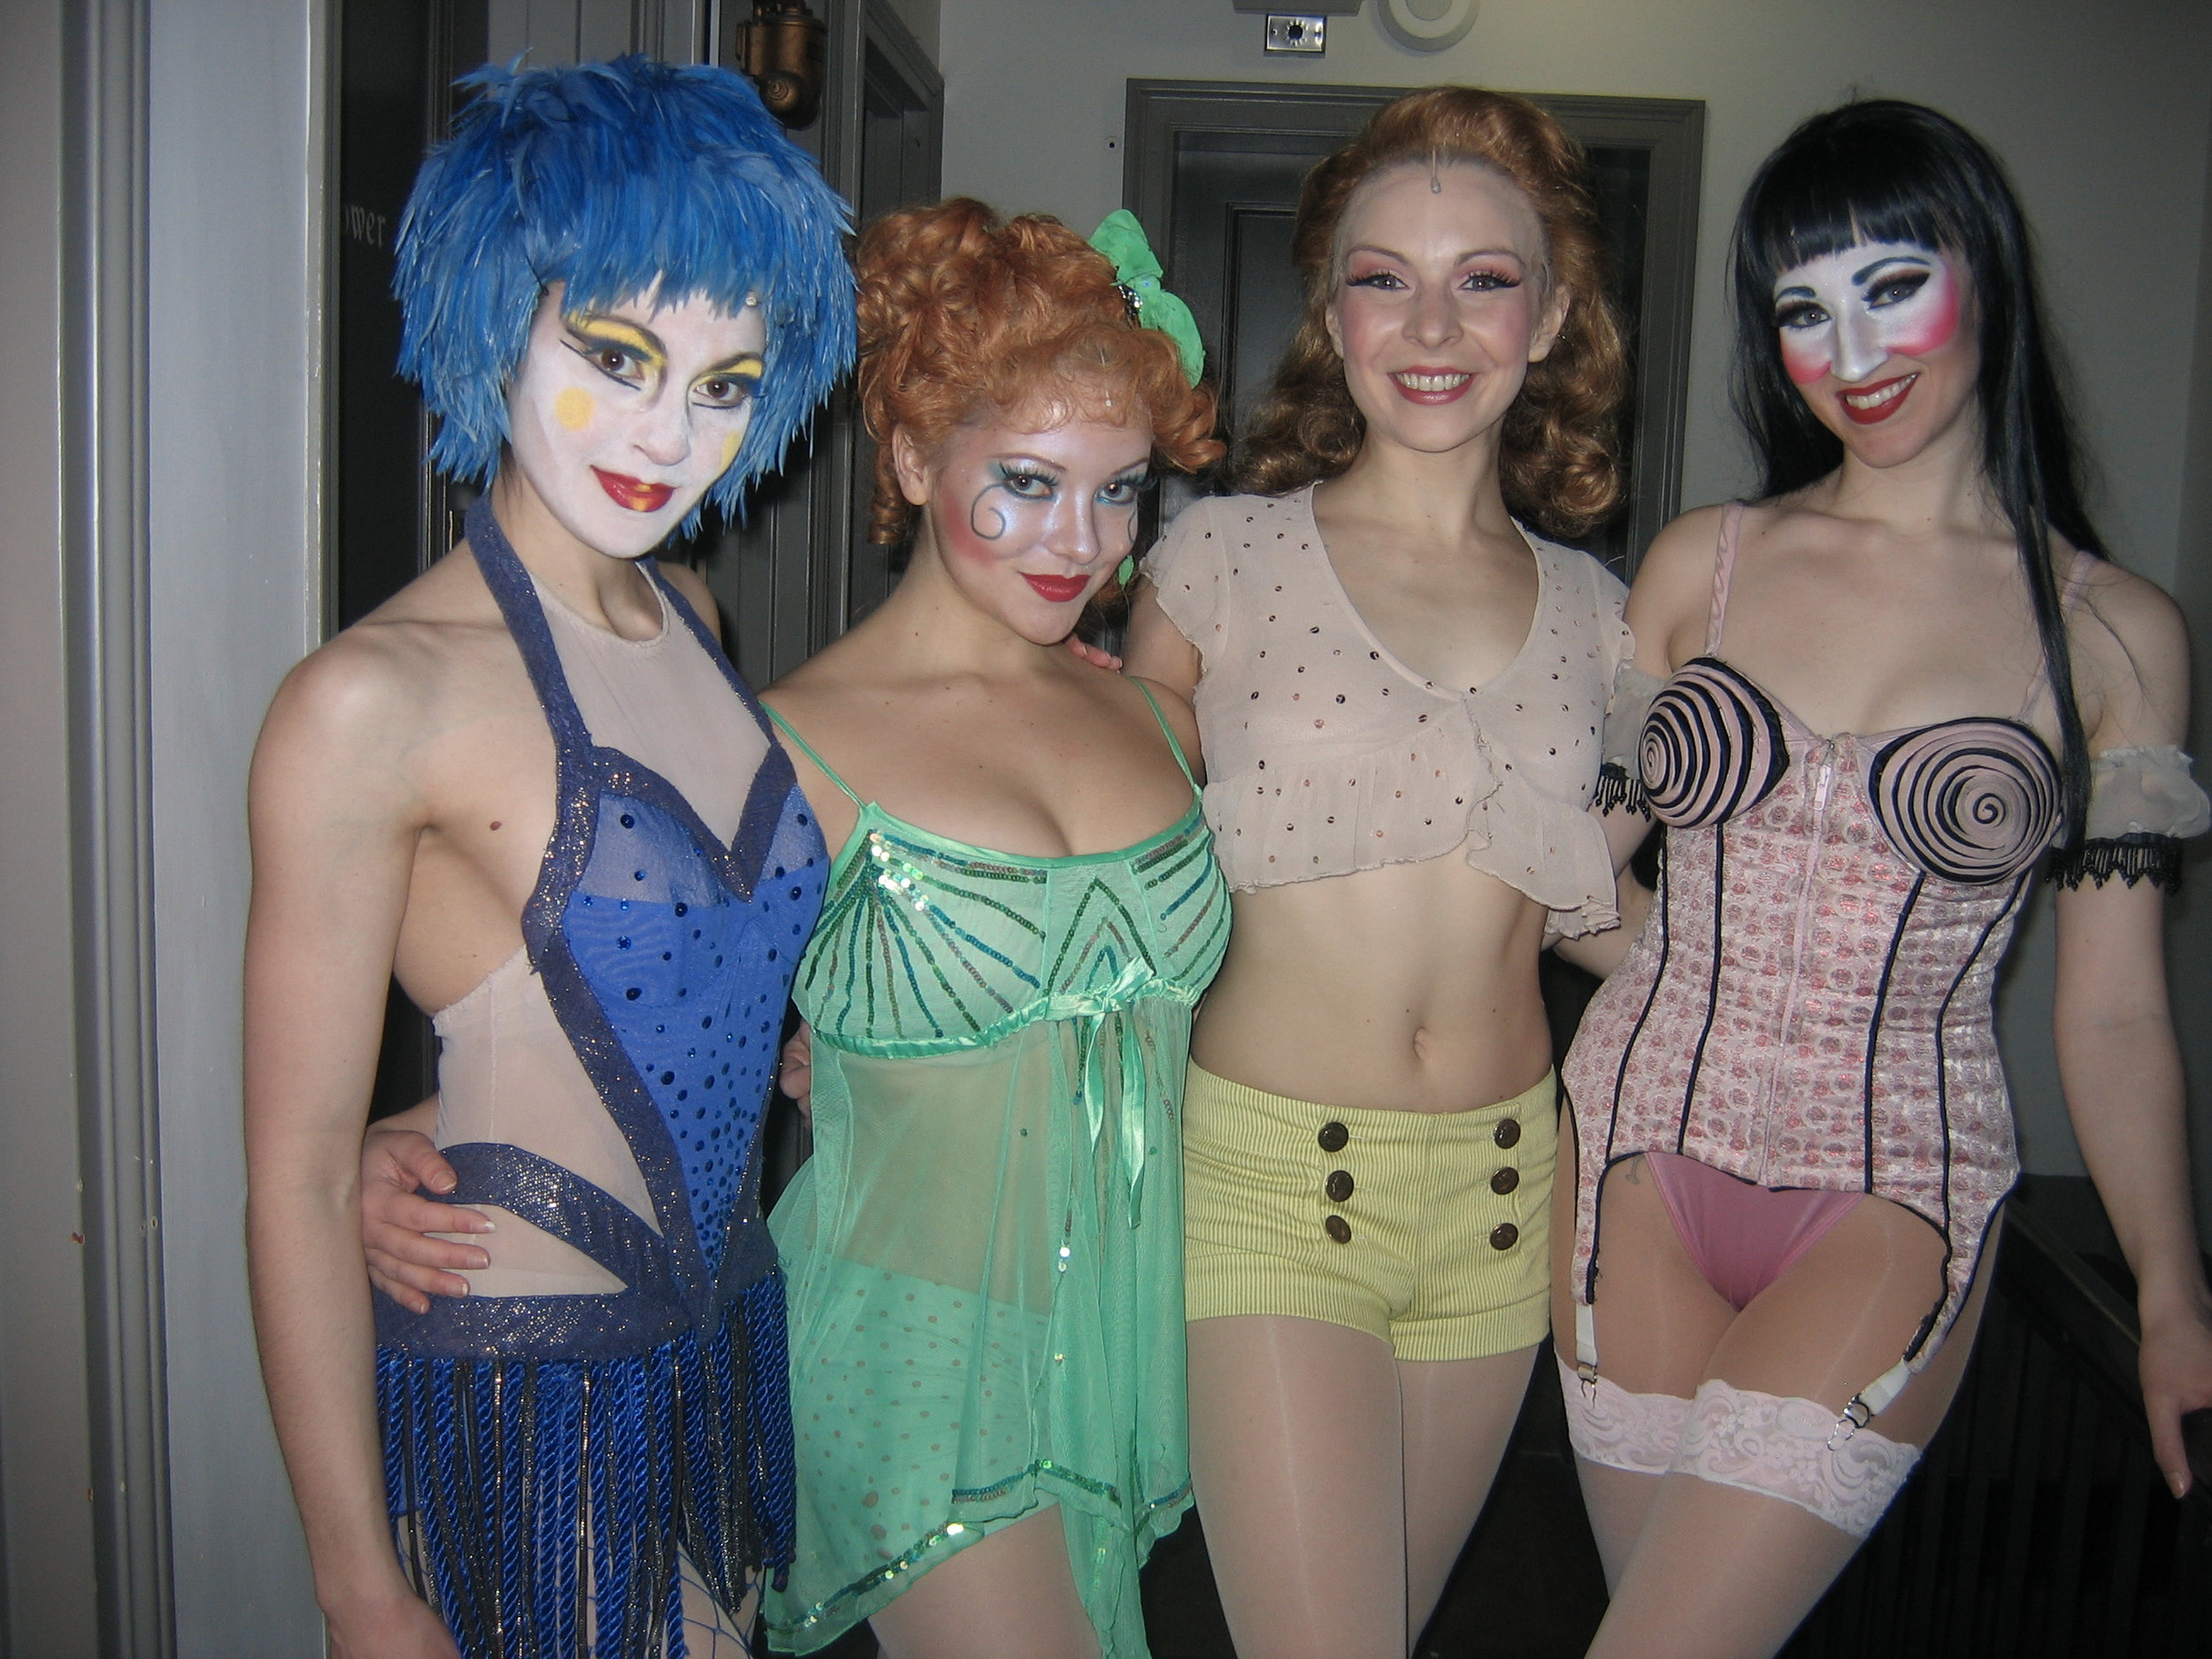 With Sara Antkowiak, Ashley Arcement, & Molly Tynes.